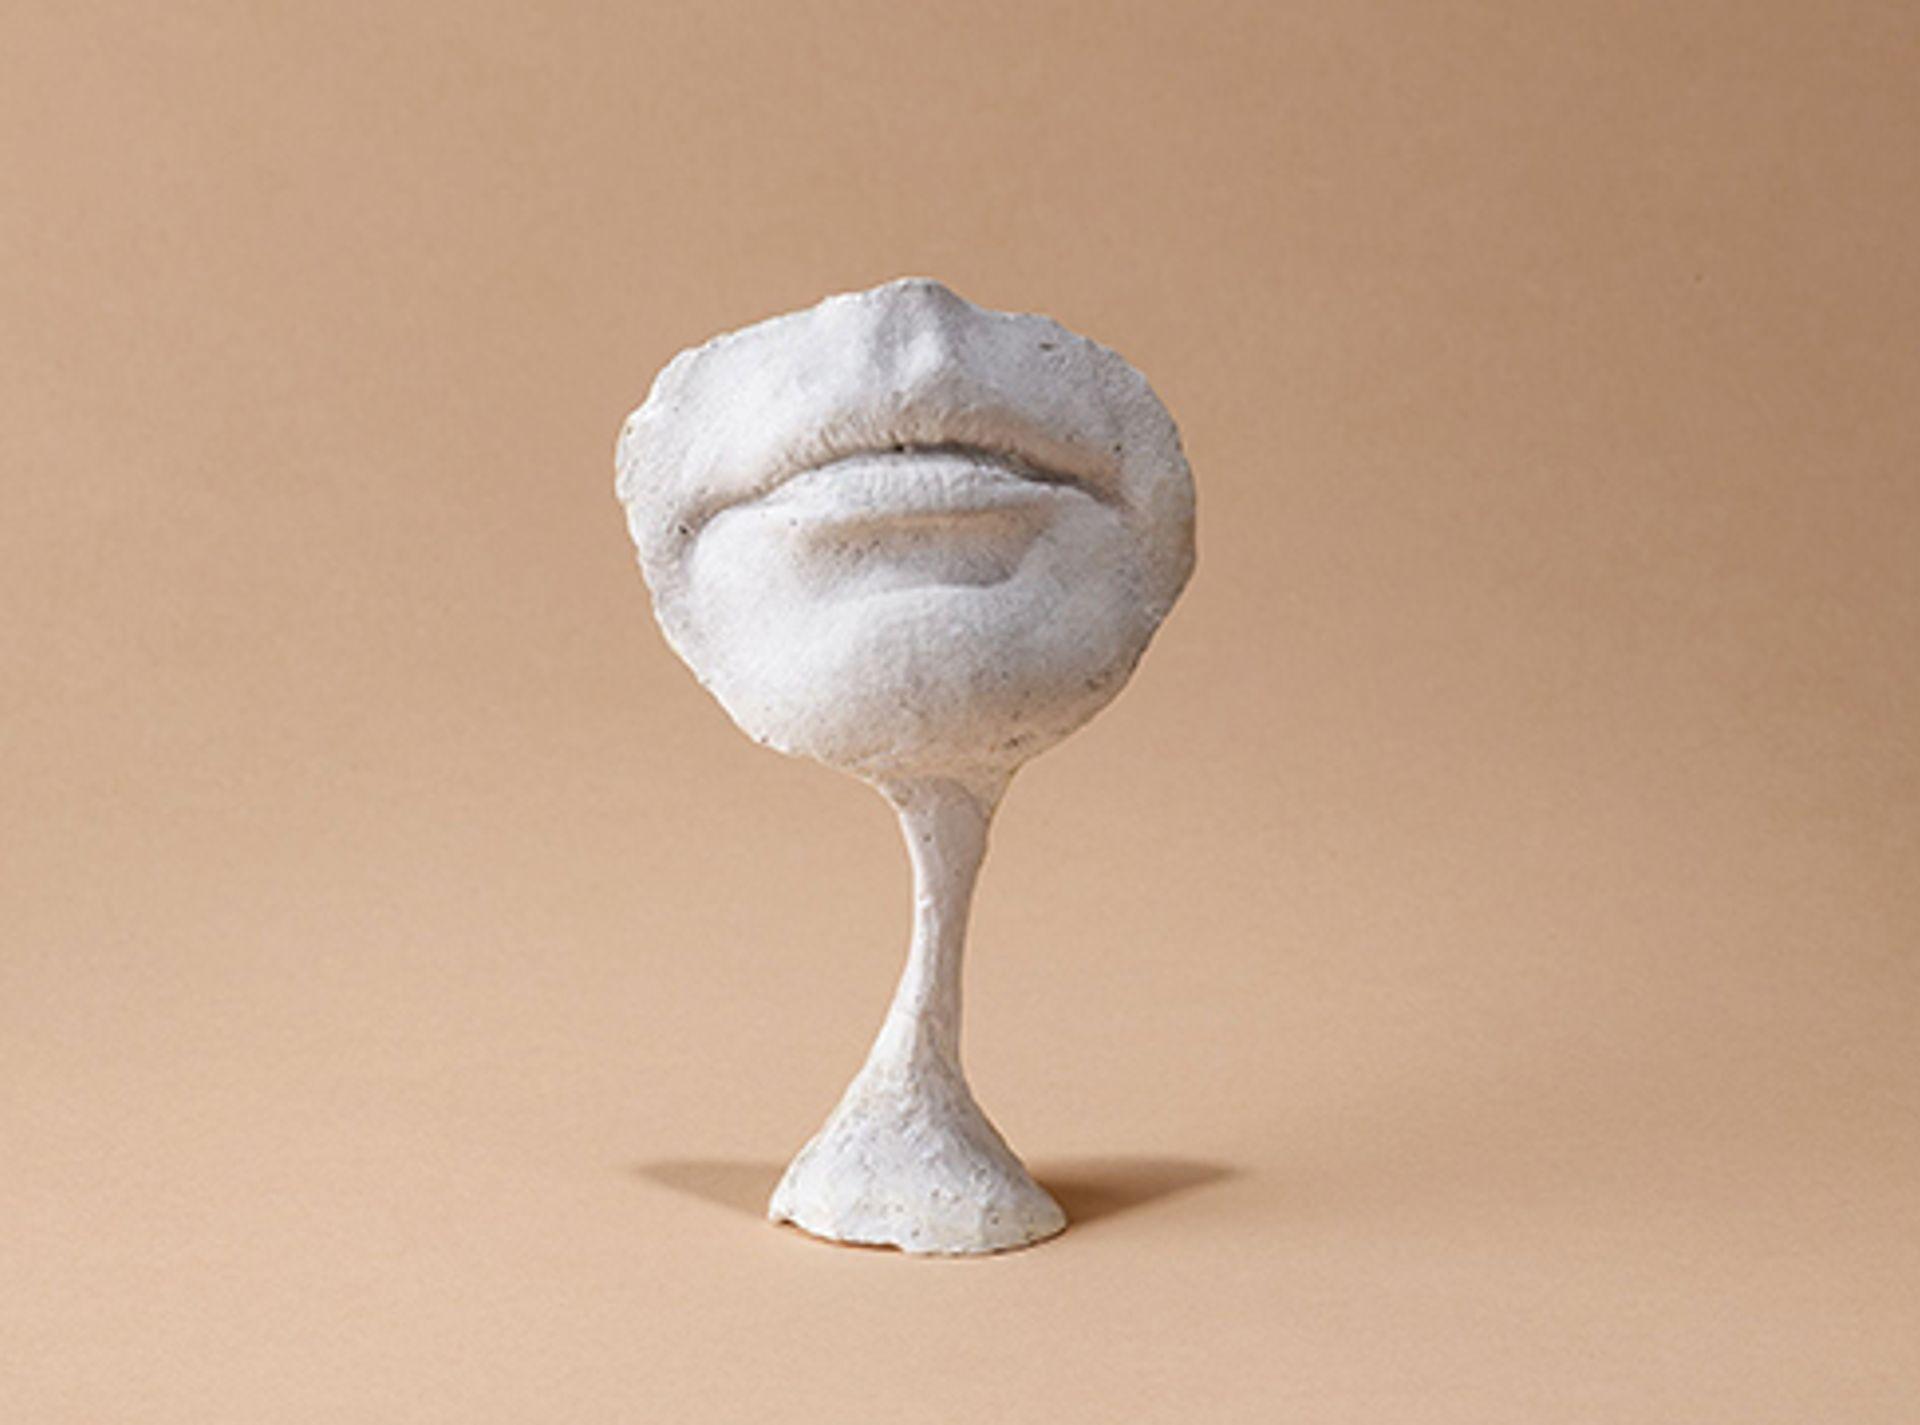 Alina Szapocznikow's Sans titre (Untitled) (1964-1965) © Thomas Barratt. Courtesy of Hauser & Wirth